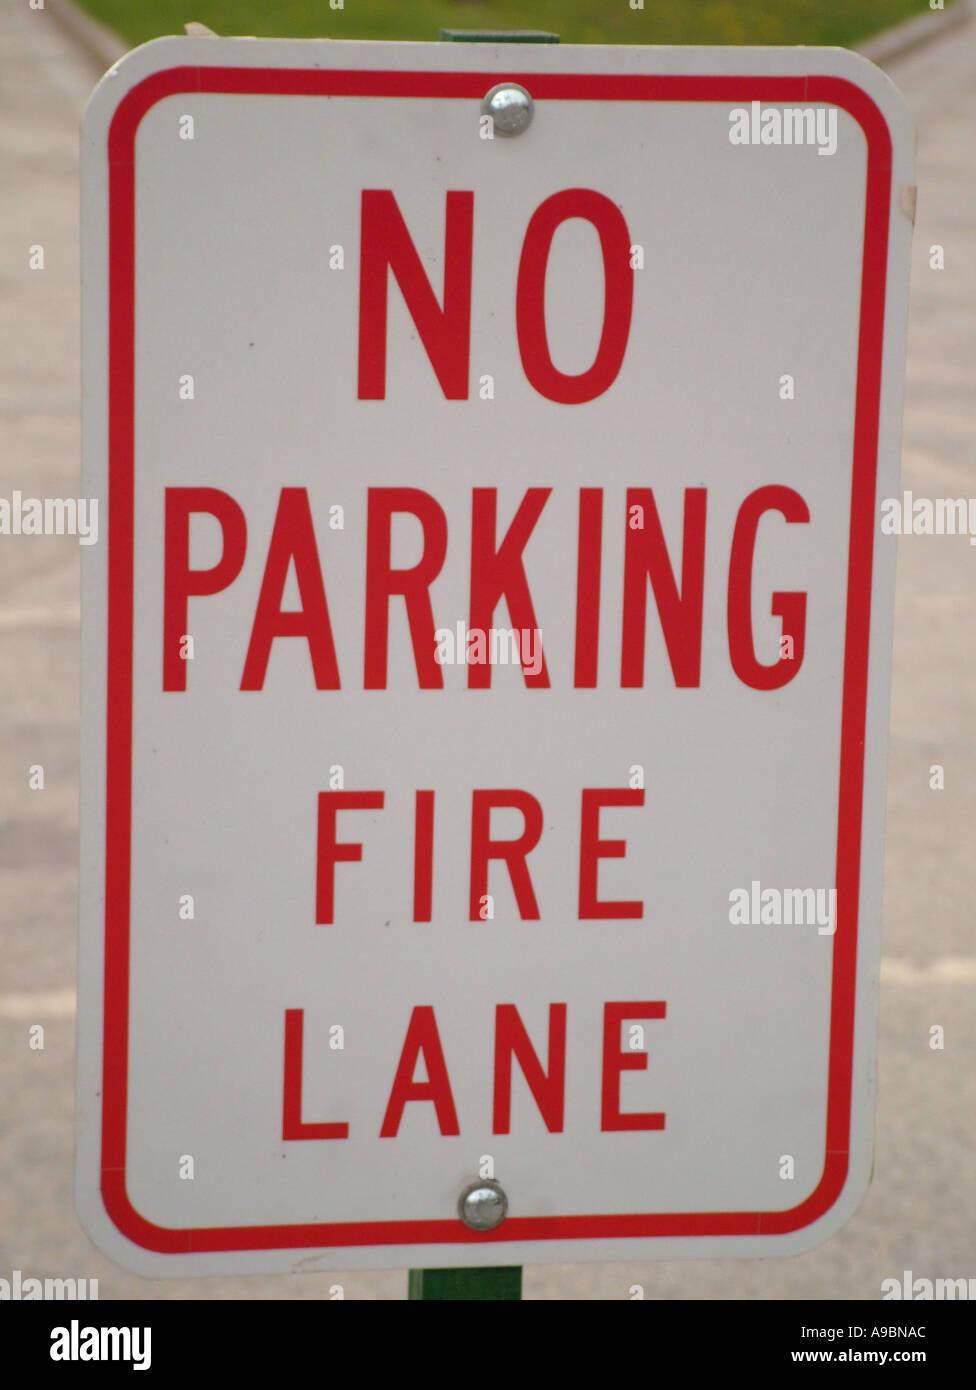 AJD42678, road sign, No Parking Fire Lane - Stock Image